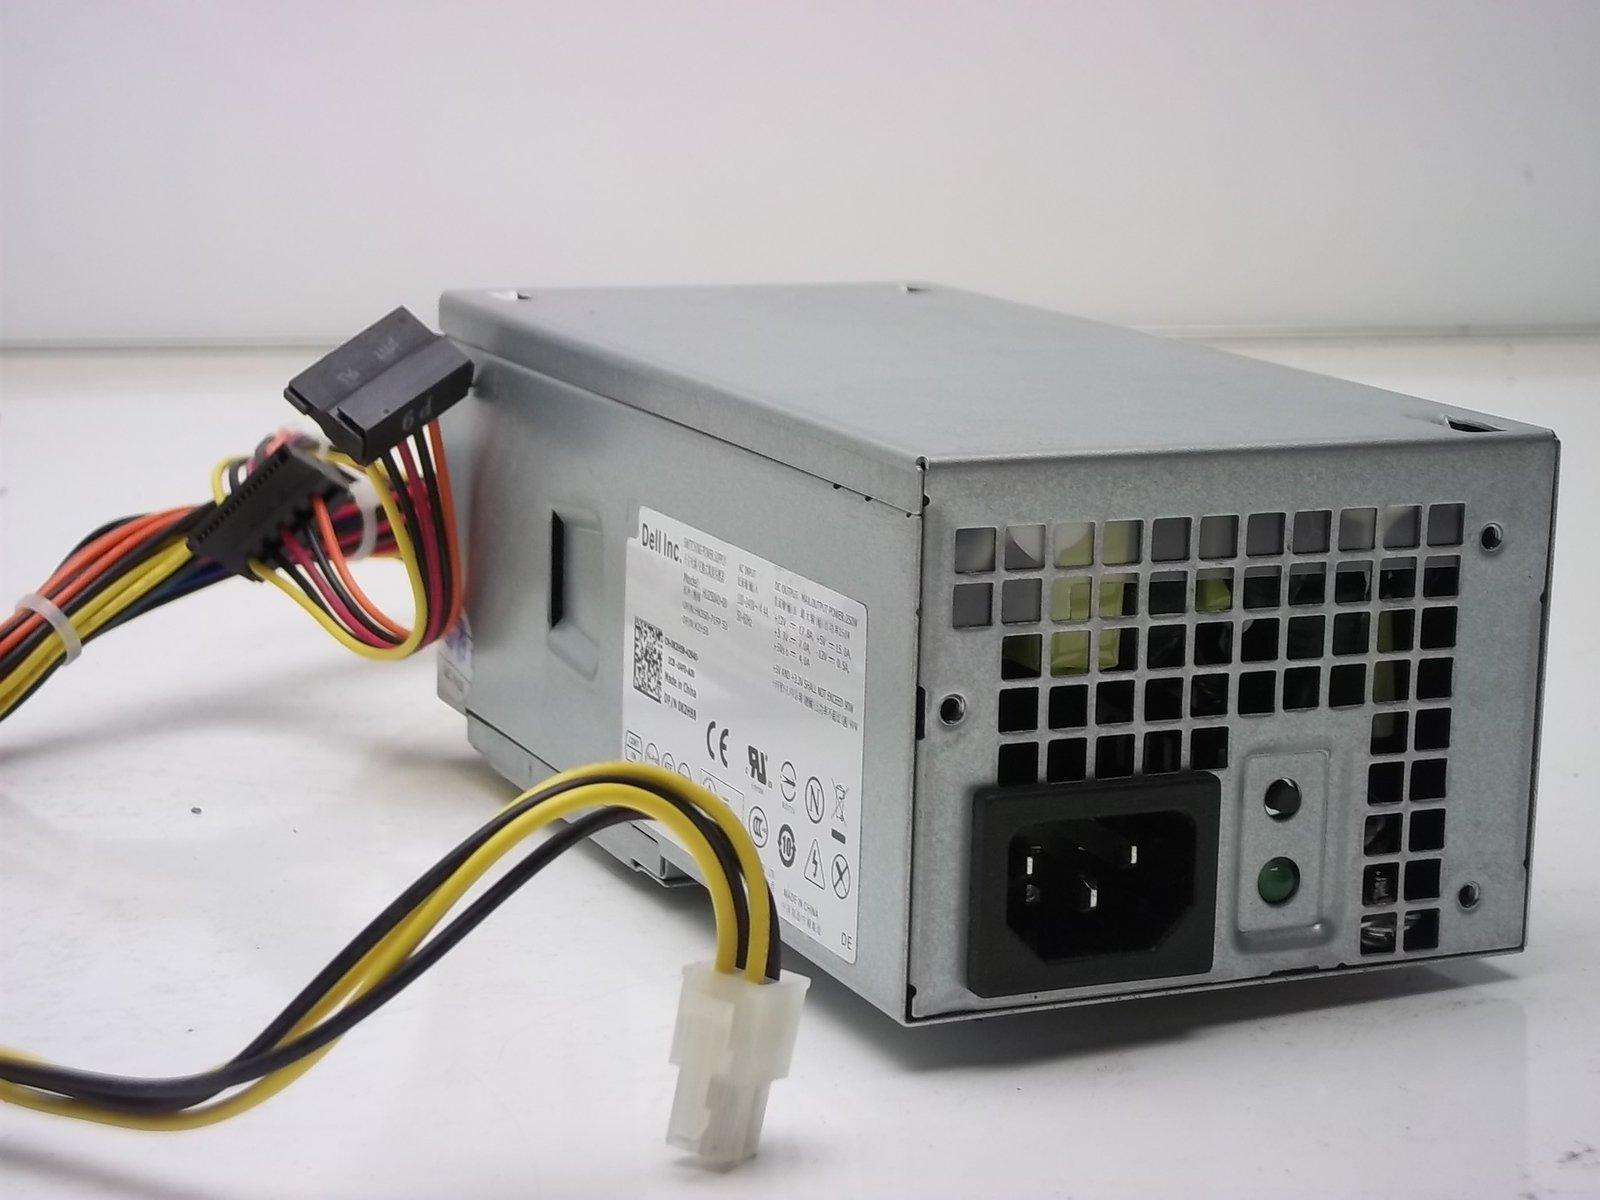 77GHN K2H58- PSU 250W Switching Delta D250AD-01 DELL Optiplex 7010 Small Desktop